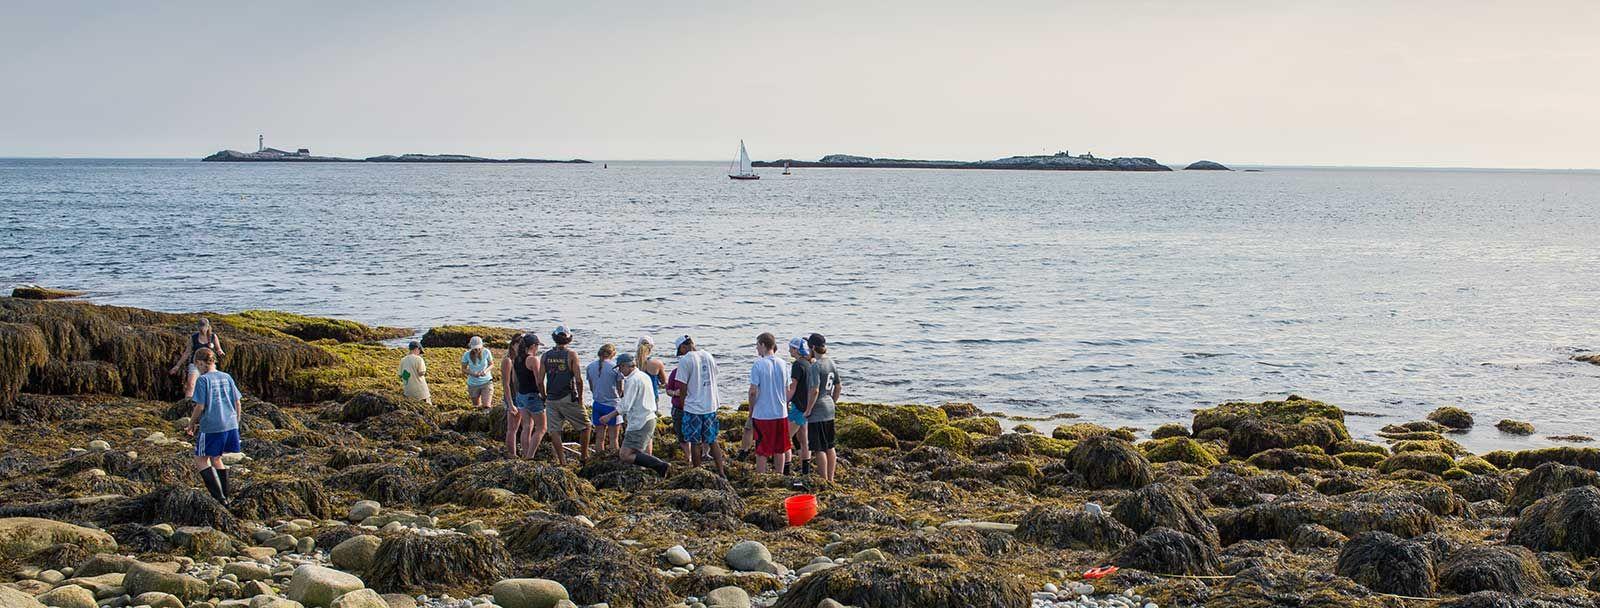 Shoals Marine Lab off coast of New Hampshire